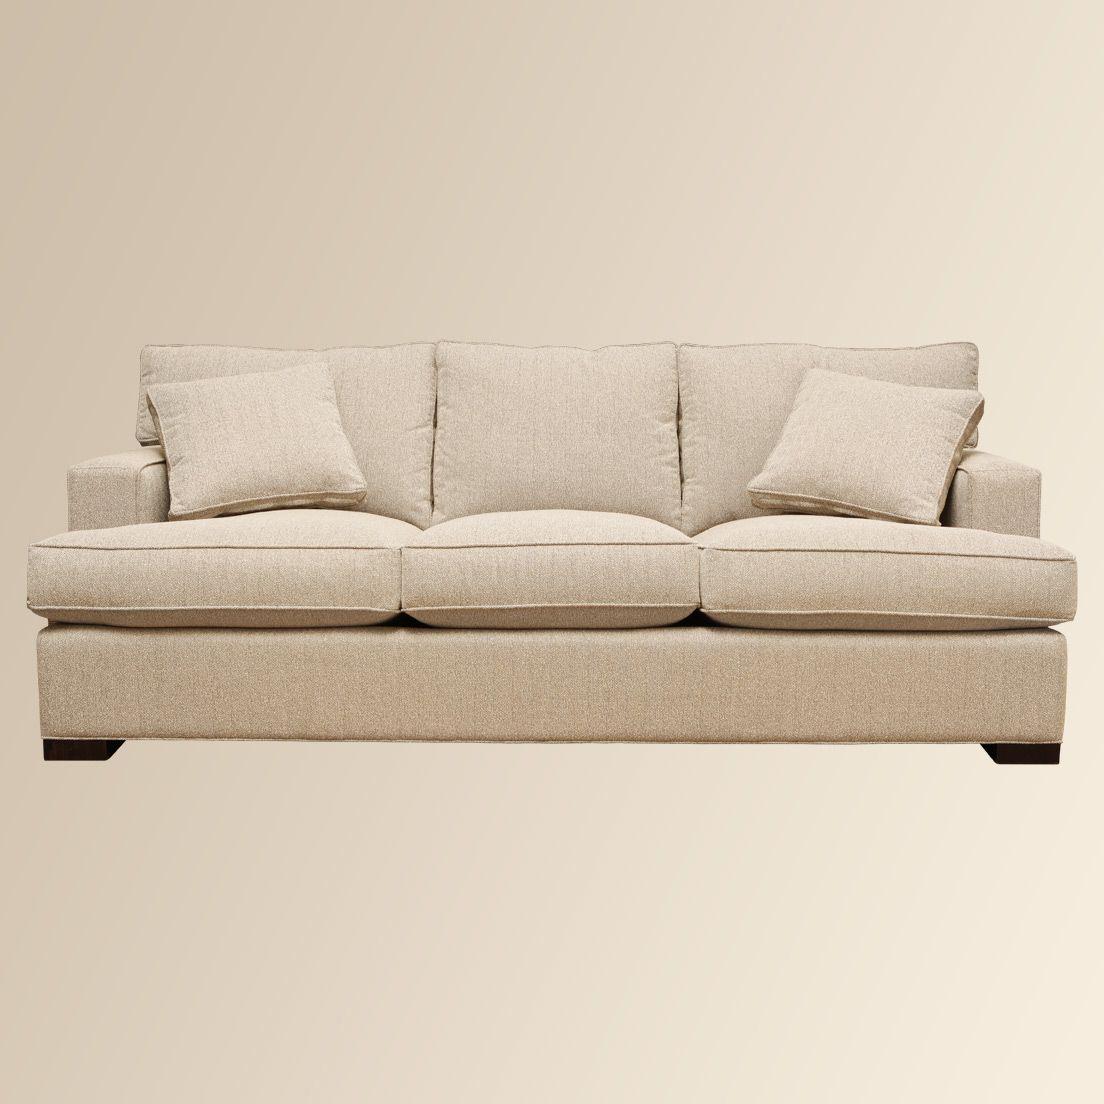 Merveilleux Arhaus Dune Sofa